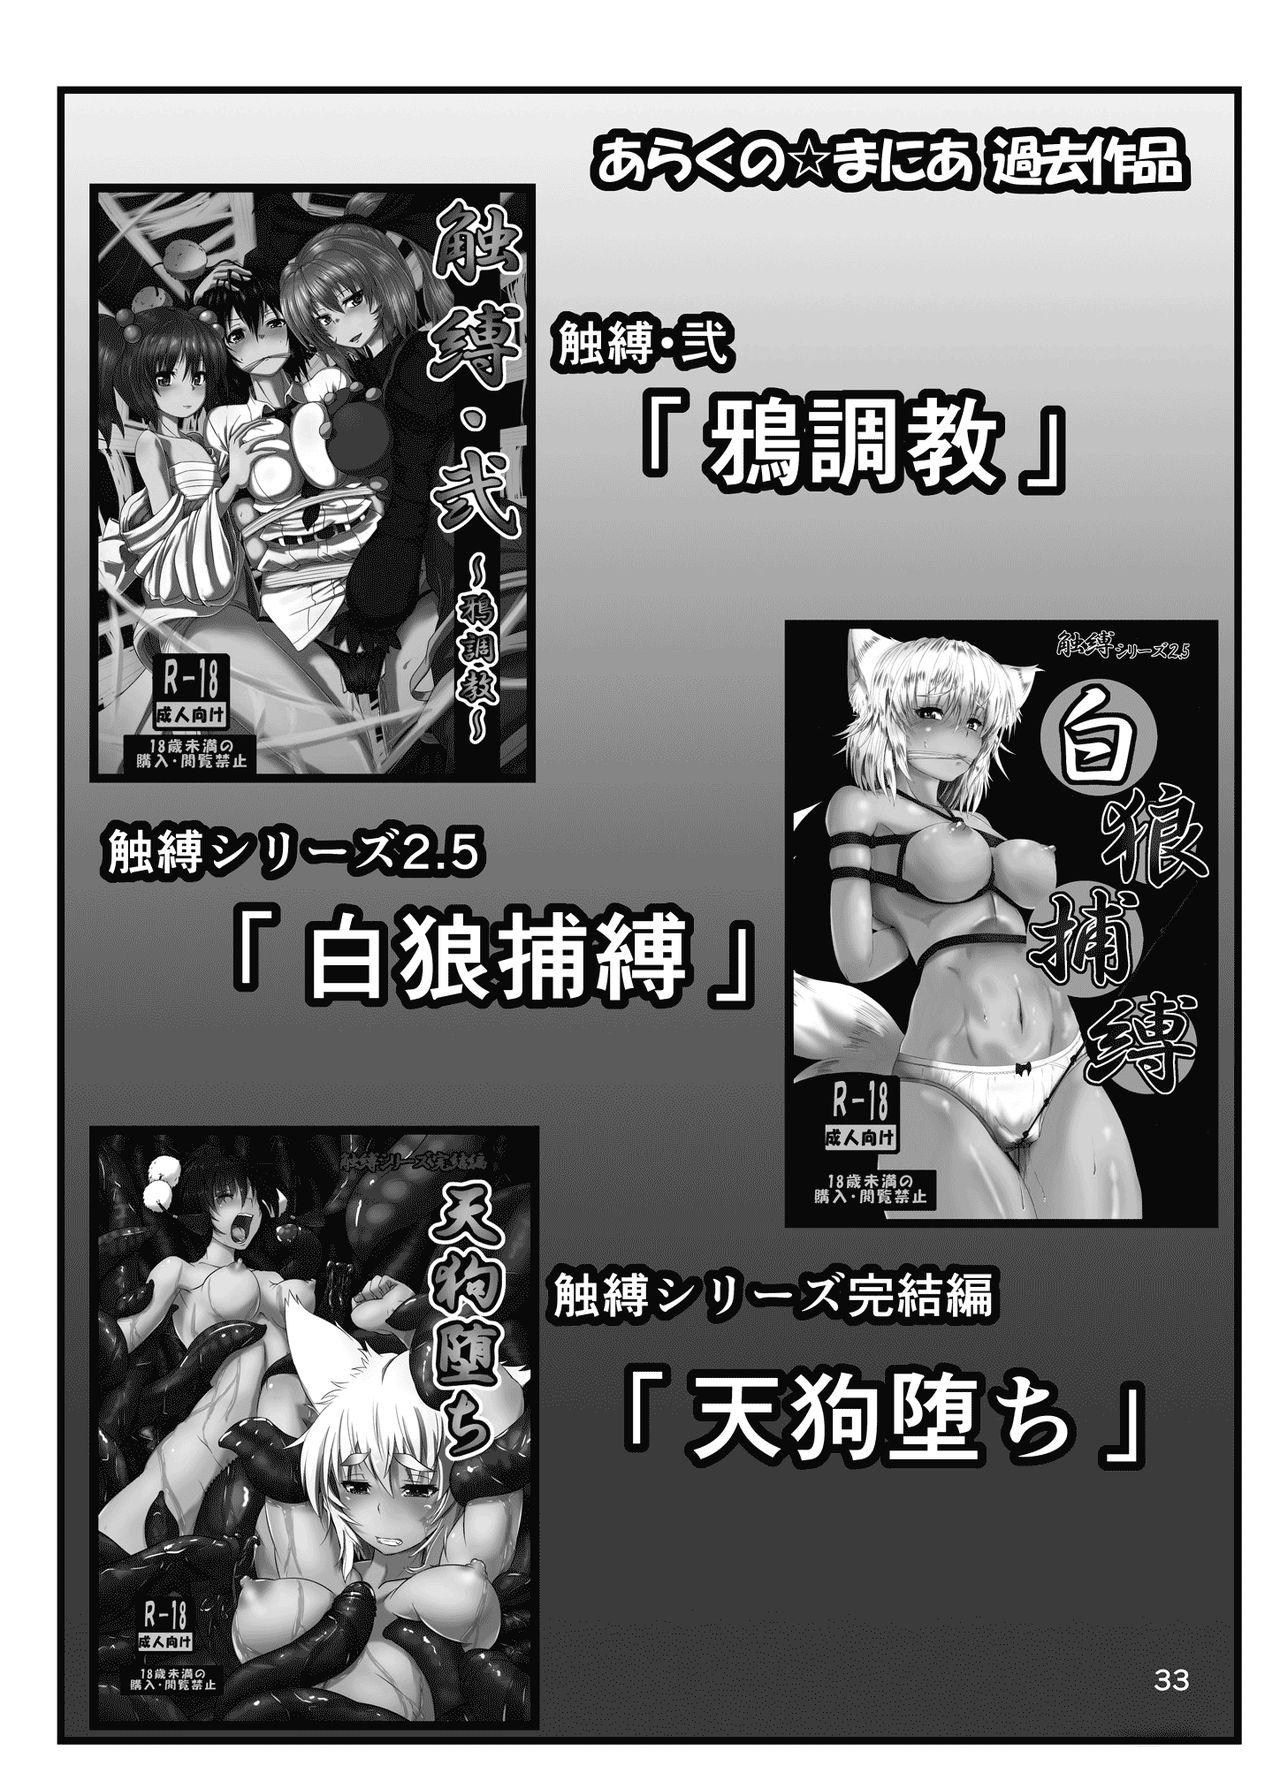 Komeiji-ke no Sei Jijou 32